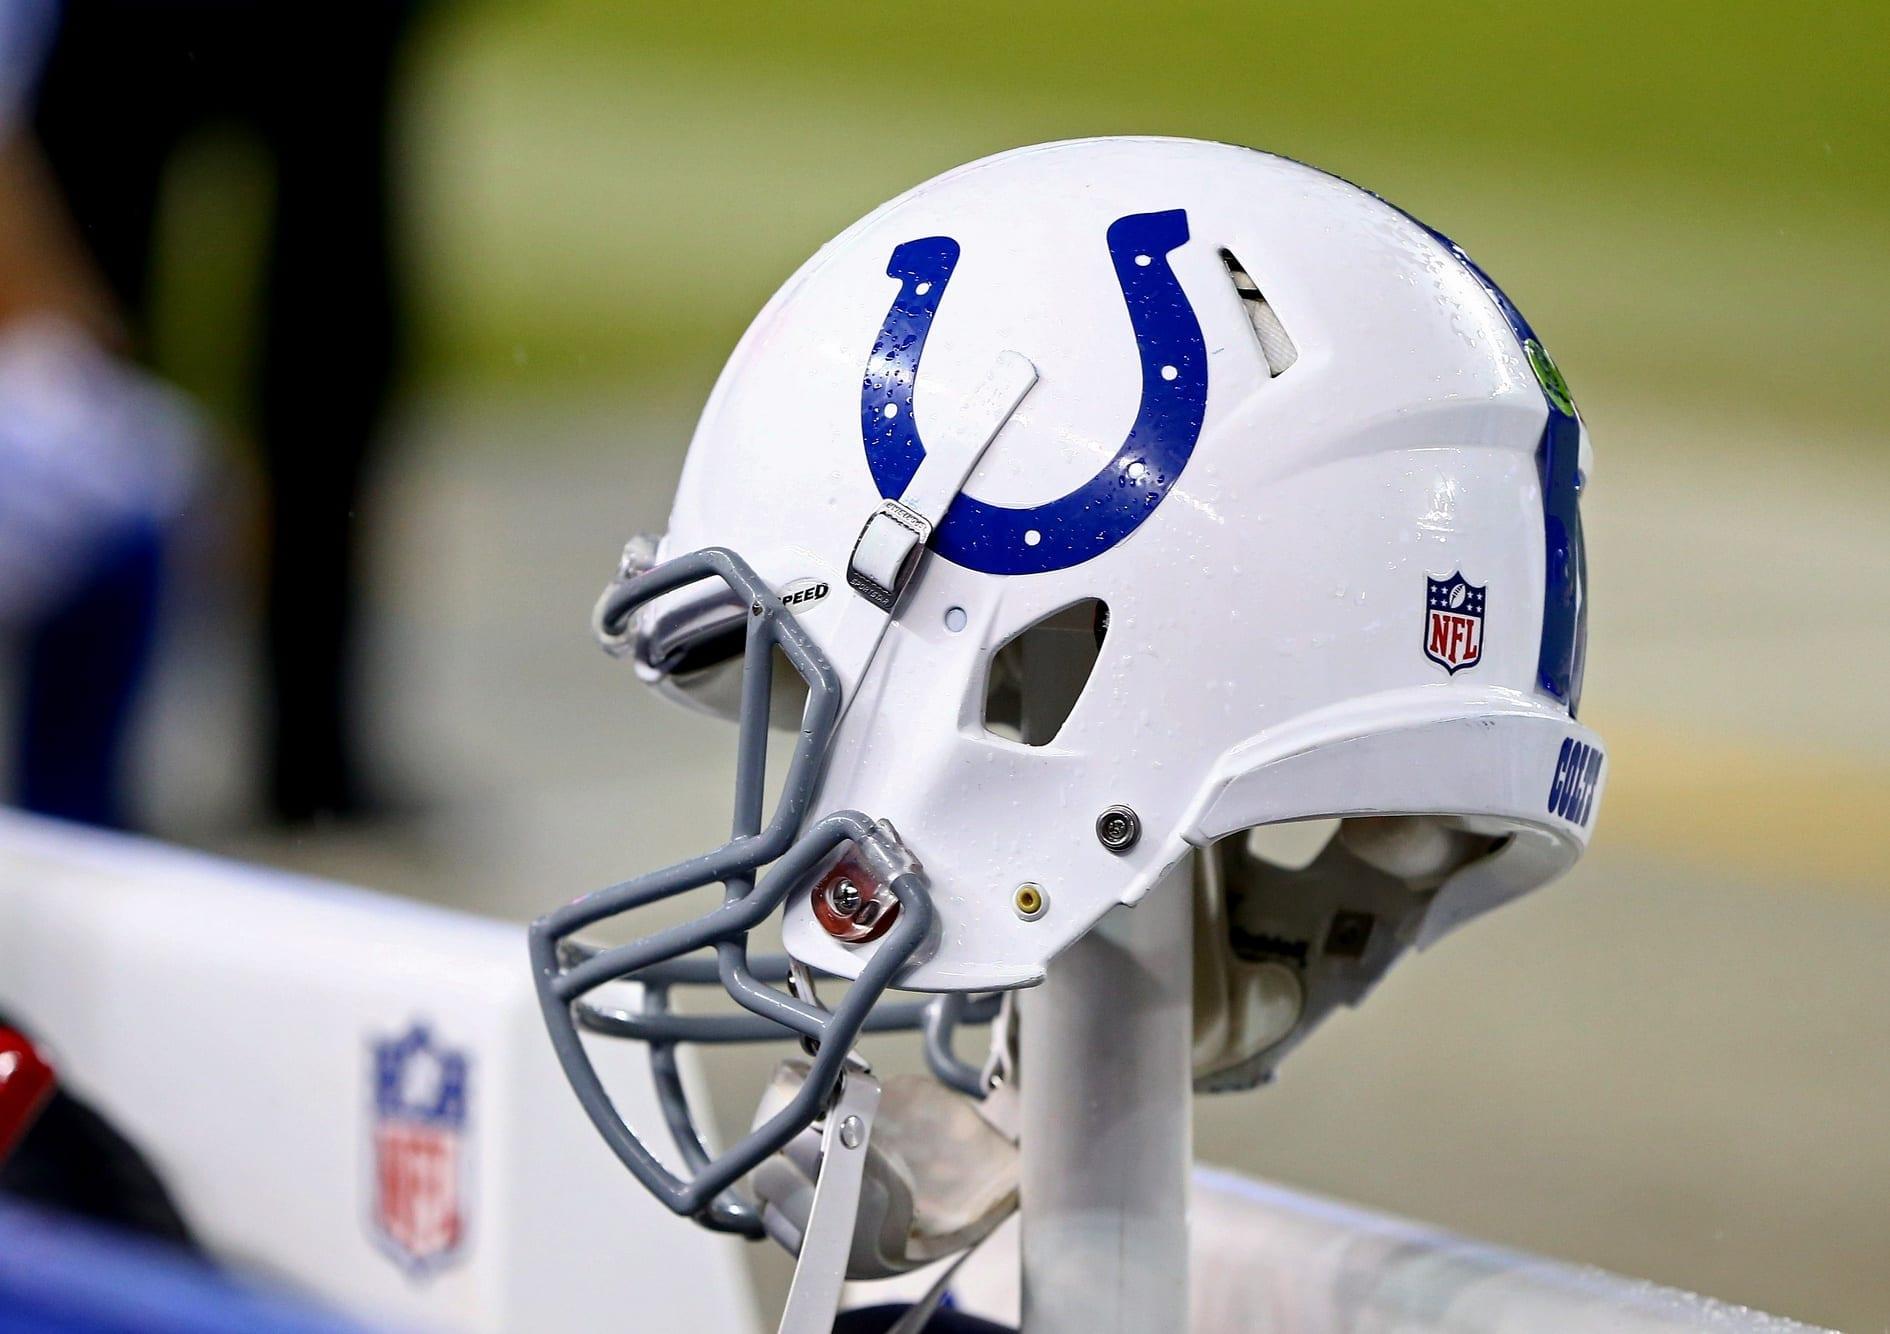 Colts-helmet-2